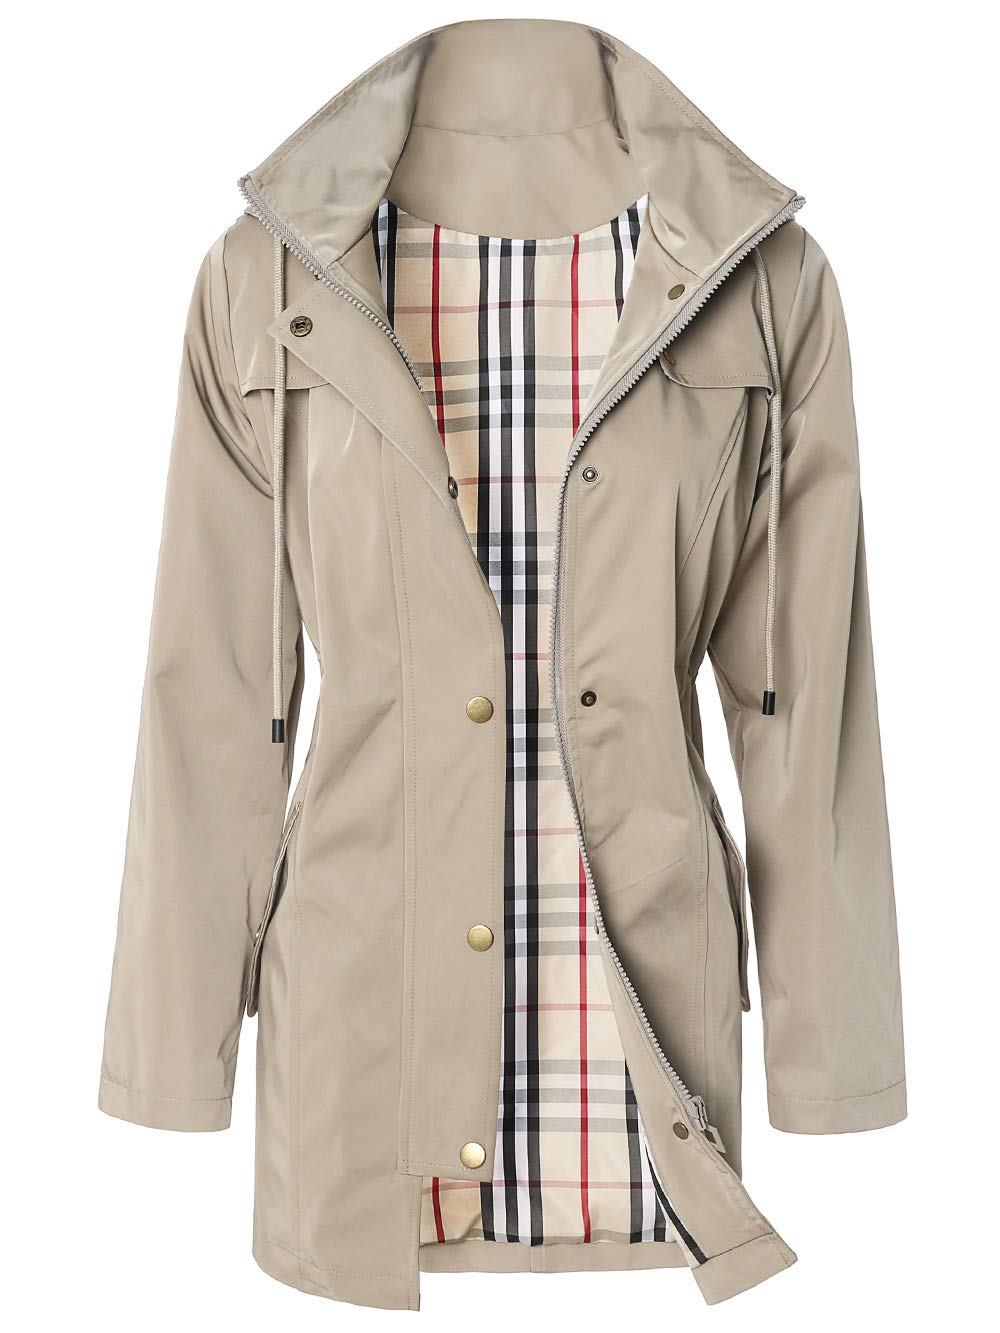 SaphiRose Women's Hooded Water-Resistant Rain Jacket Coat (Khaki,XXL) by SaphiRose